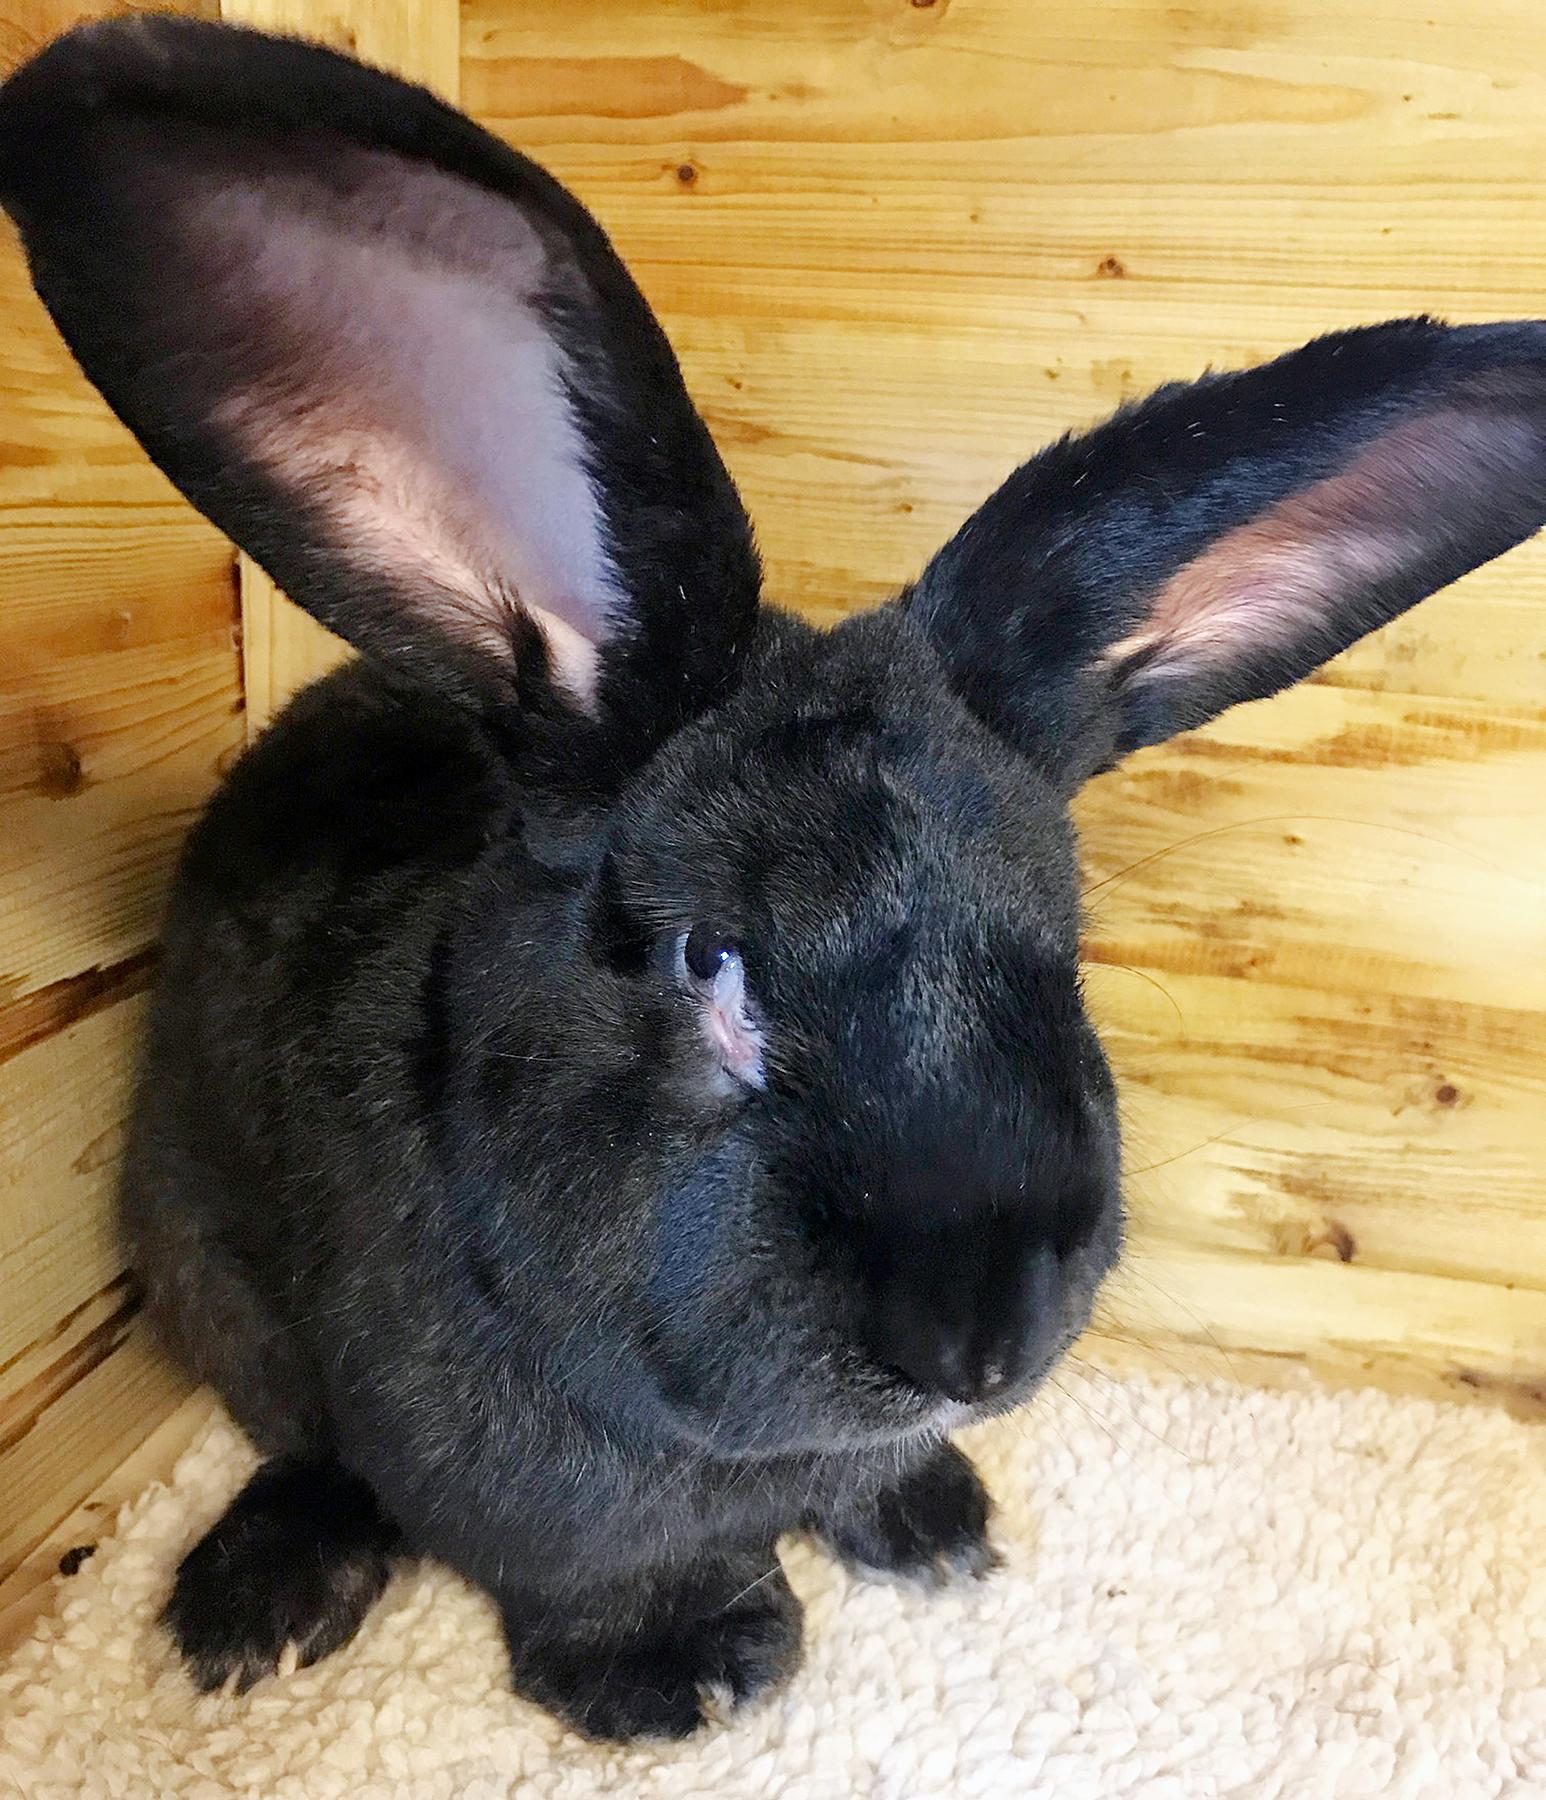 Simon the bunny rabbit